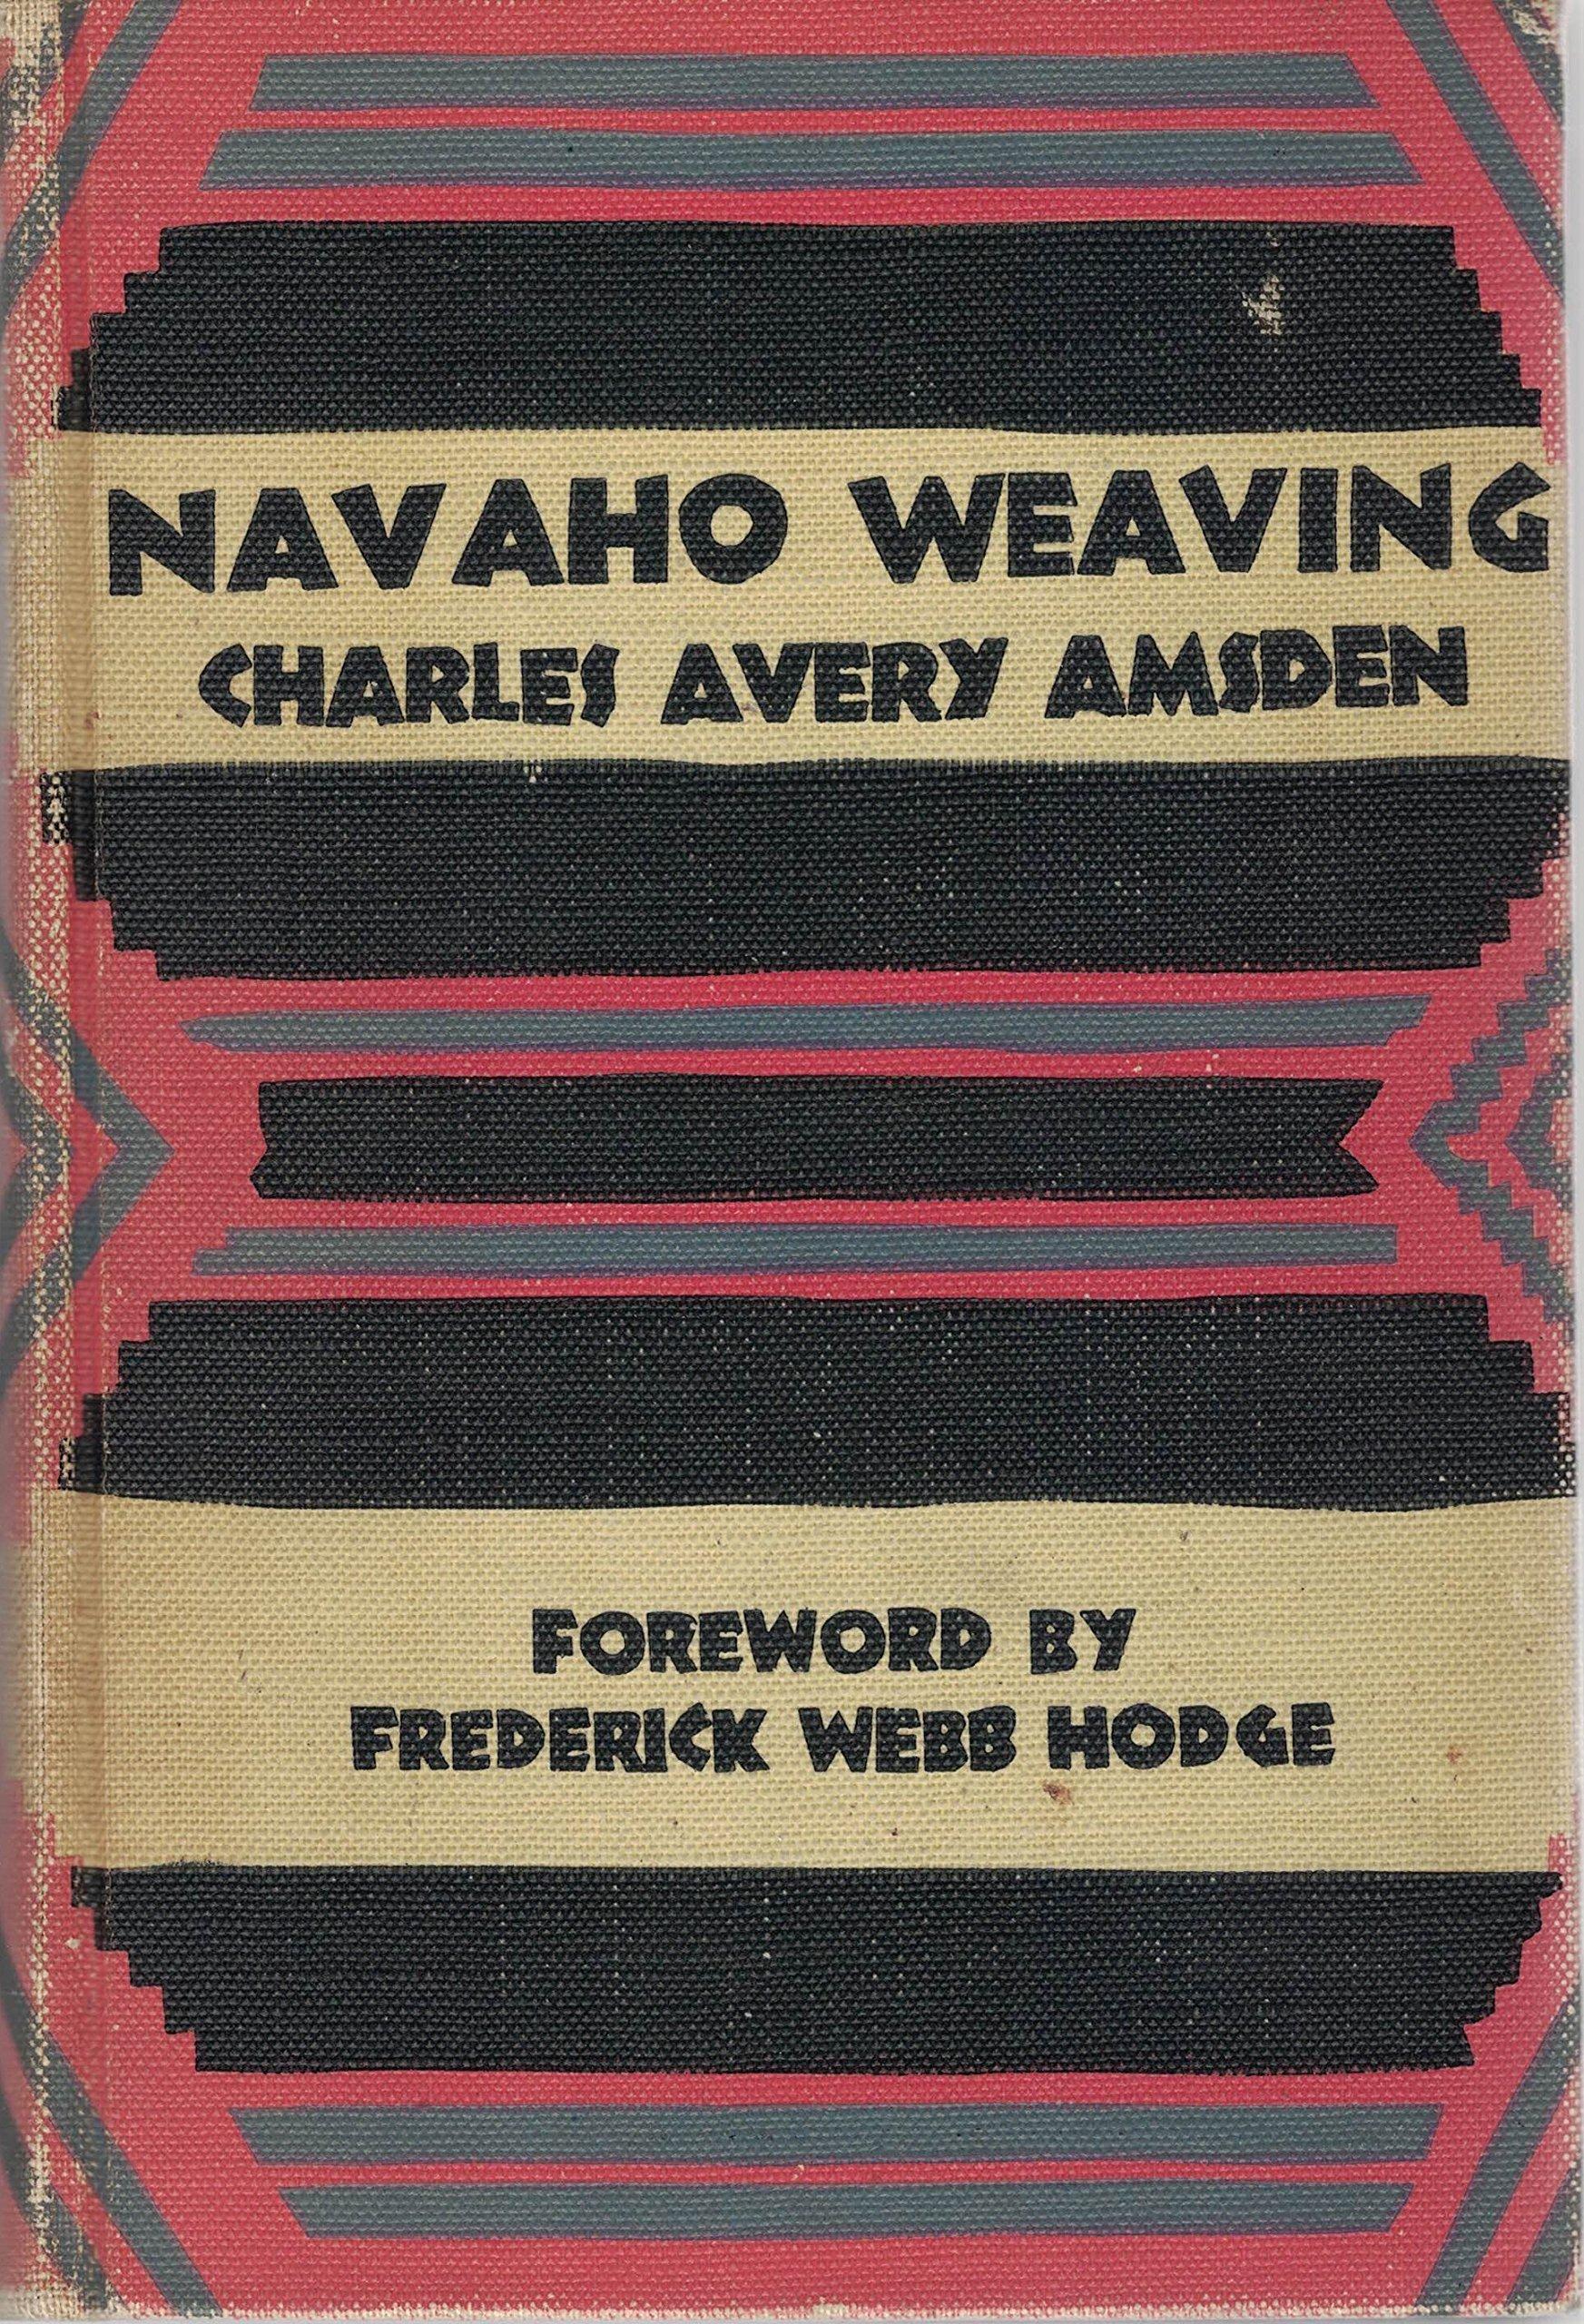 NAVAHO WEAVING: